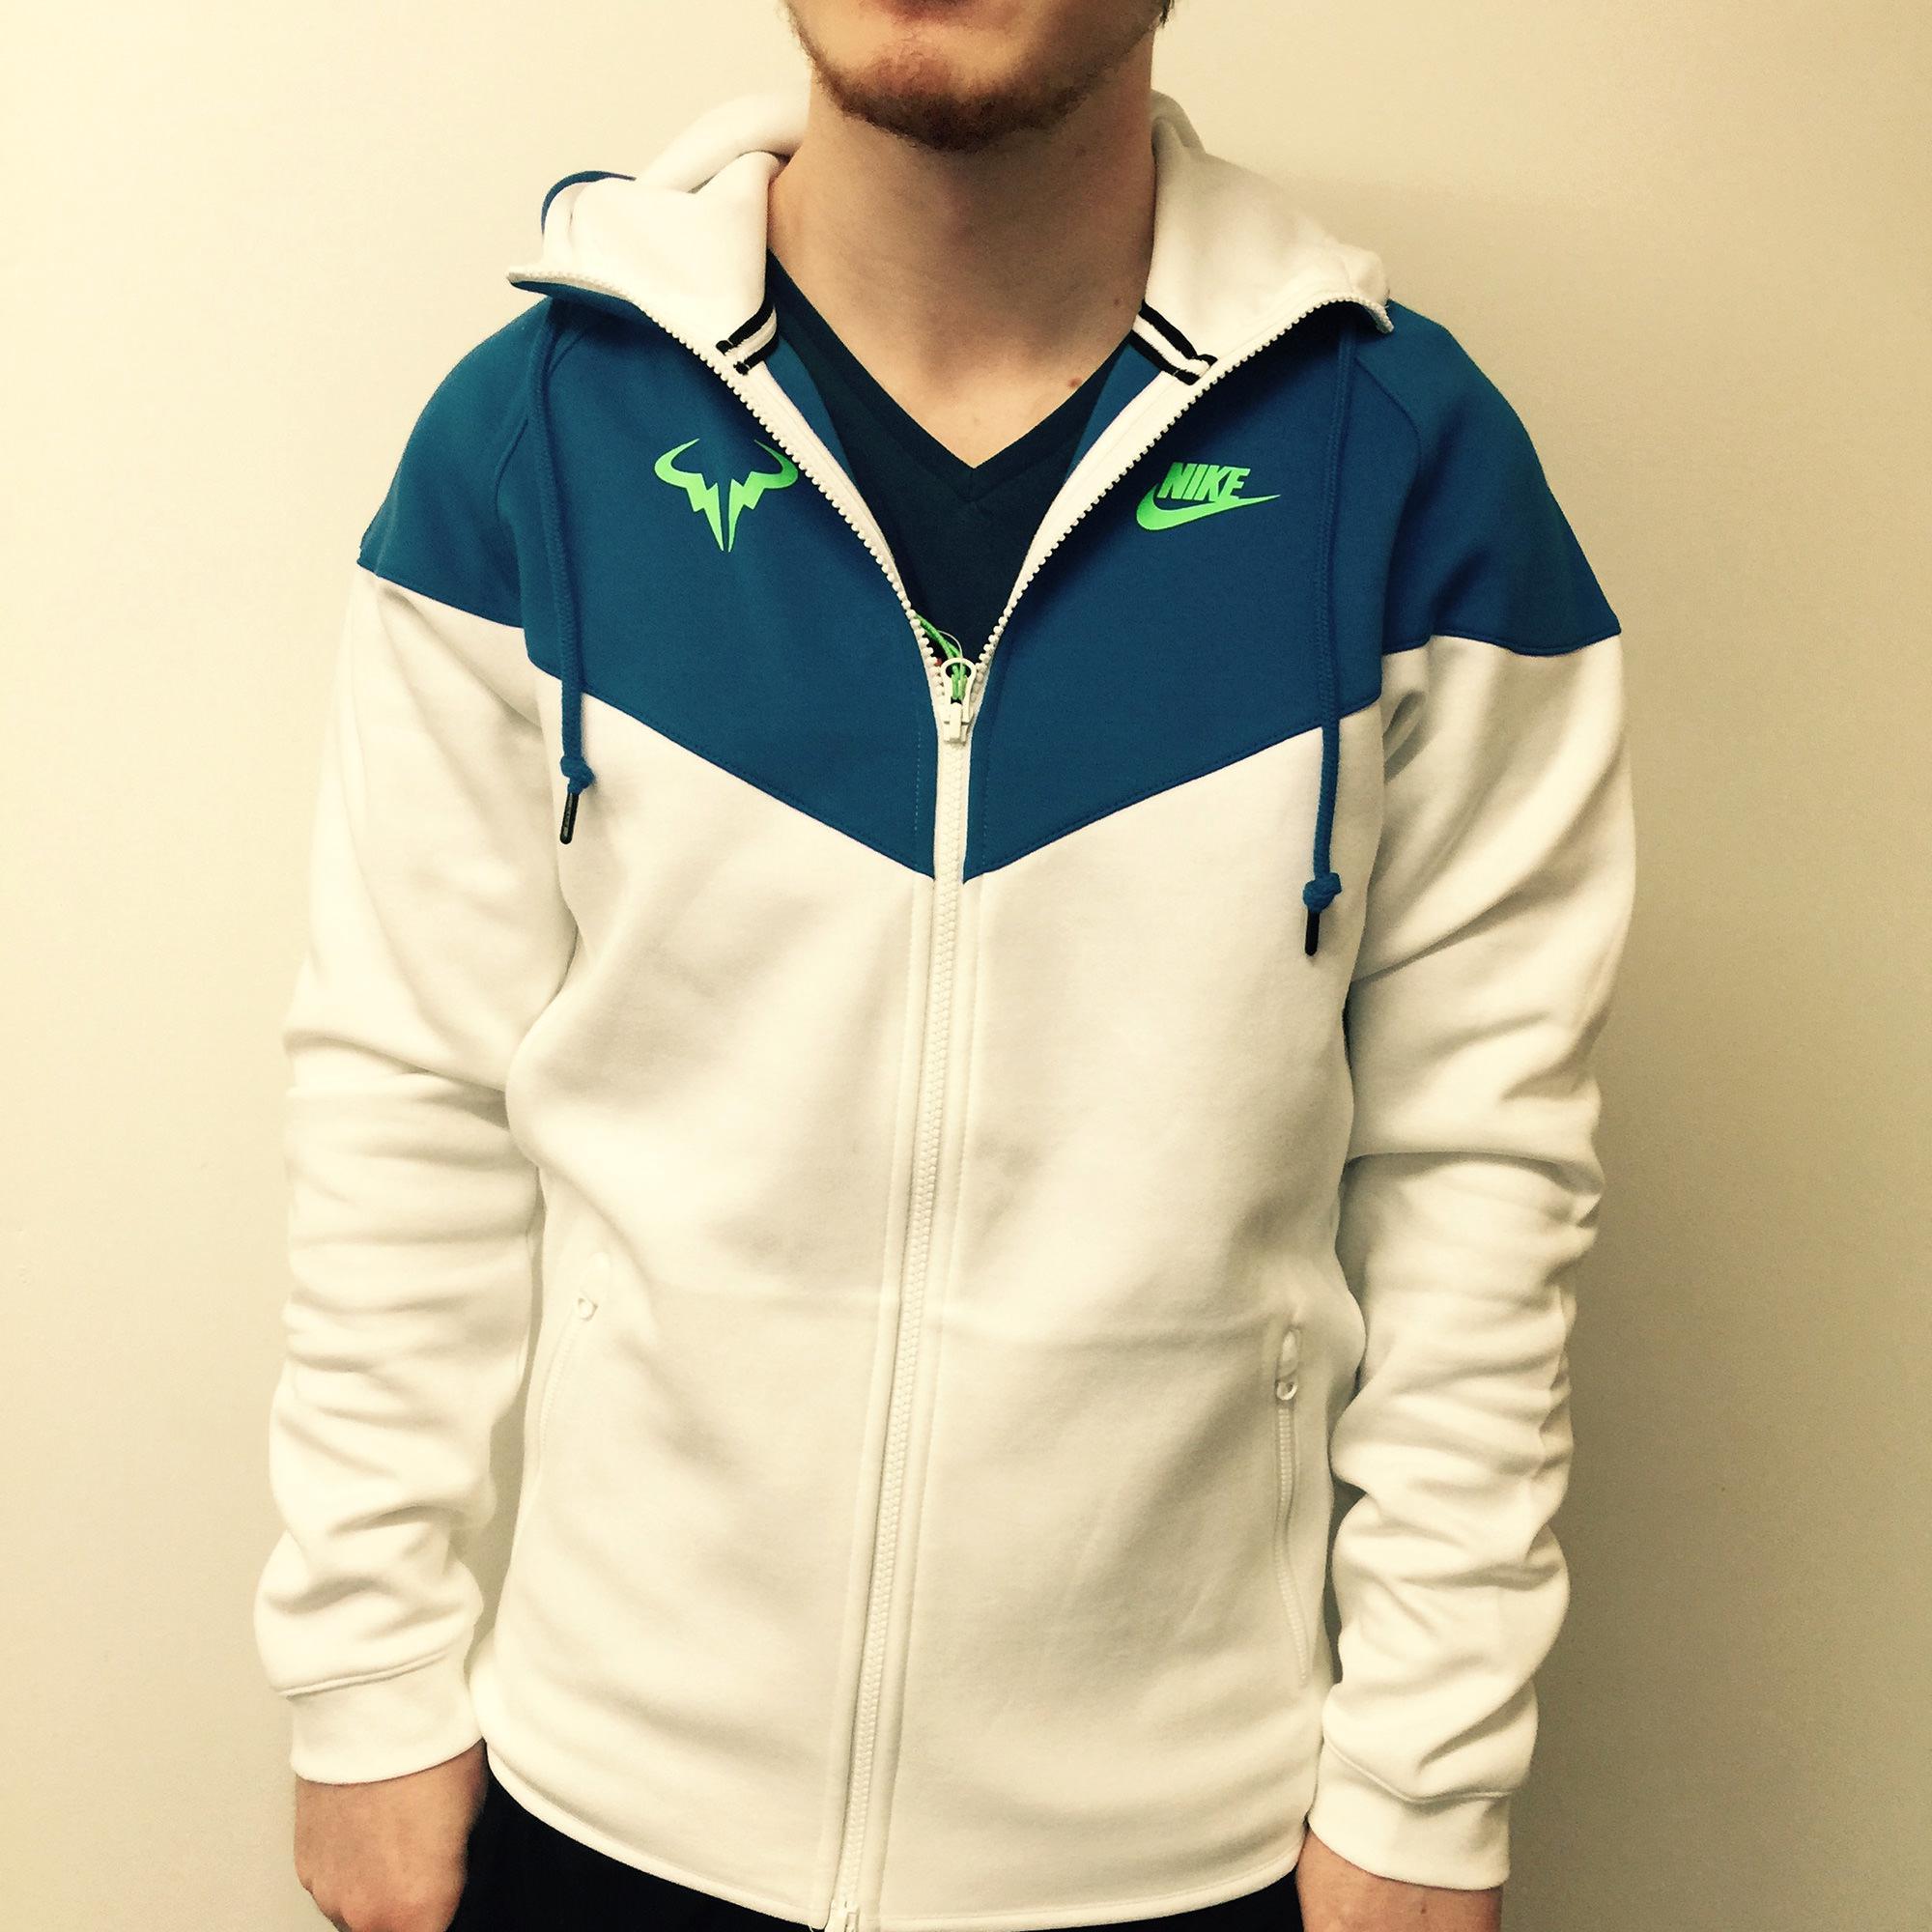 281f3a12d493 Nike Mens Premier Rafa Jacket - White Soar Green Strike - Tennisnuts.com